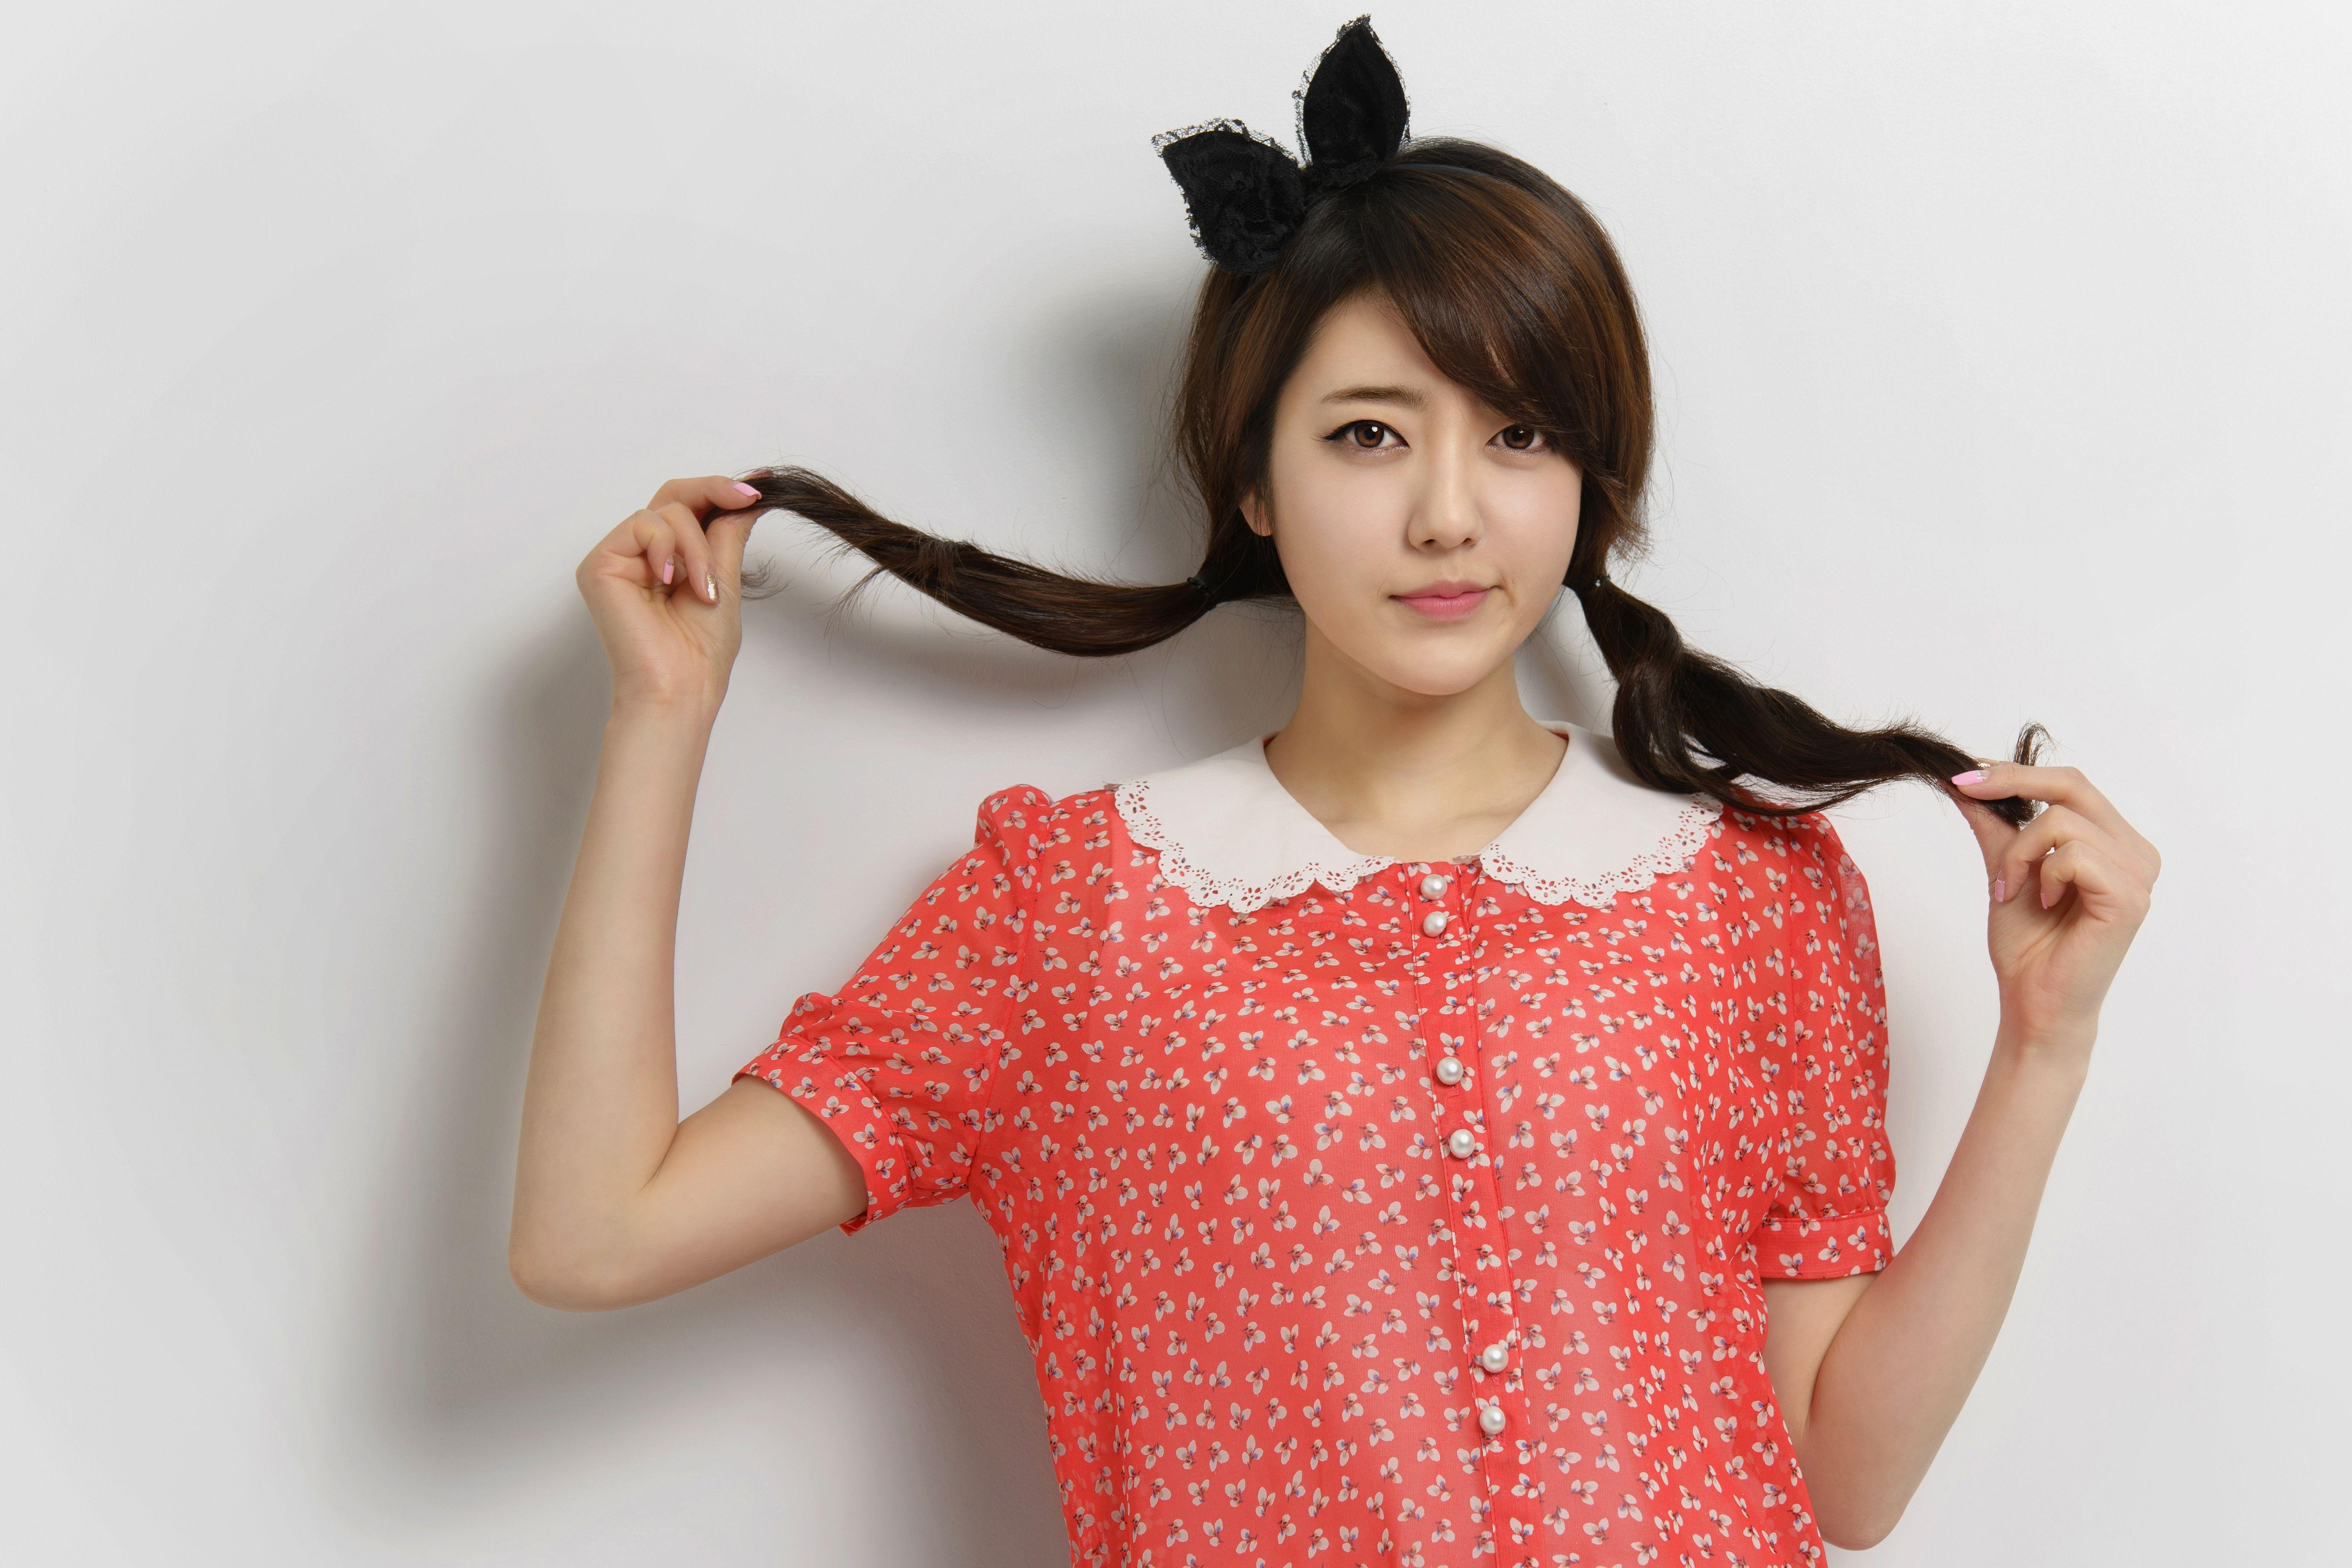 Shin Min Ah Cute Wallpaper Korean Model Wallpaper Group 52